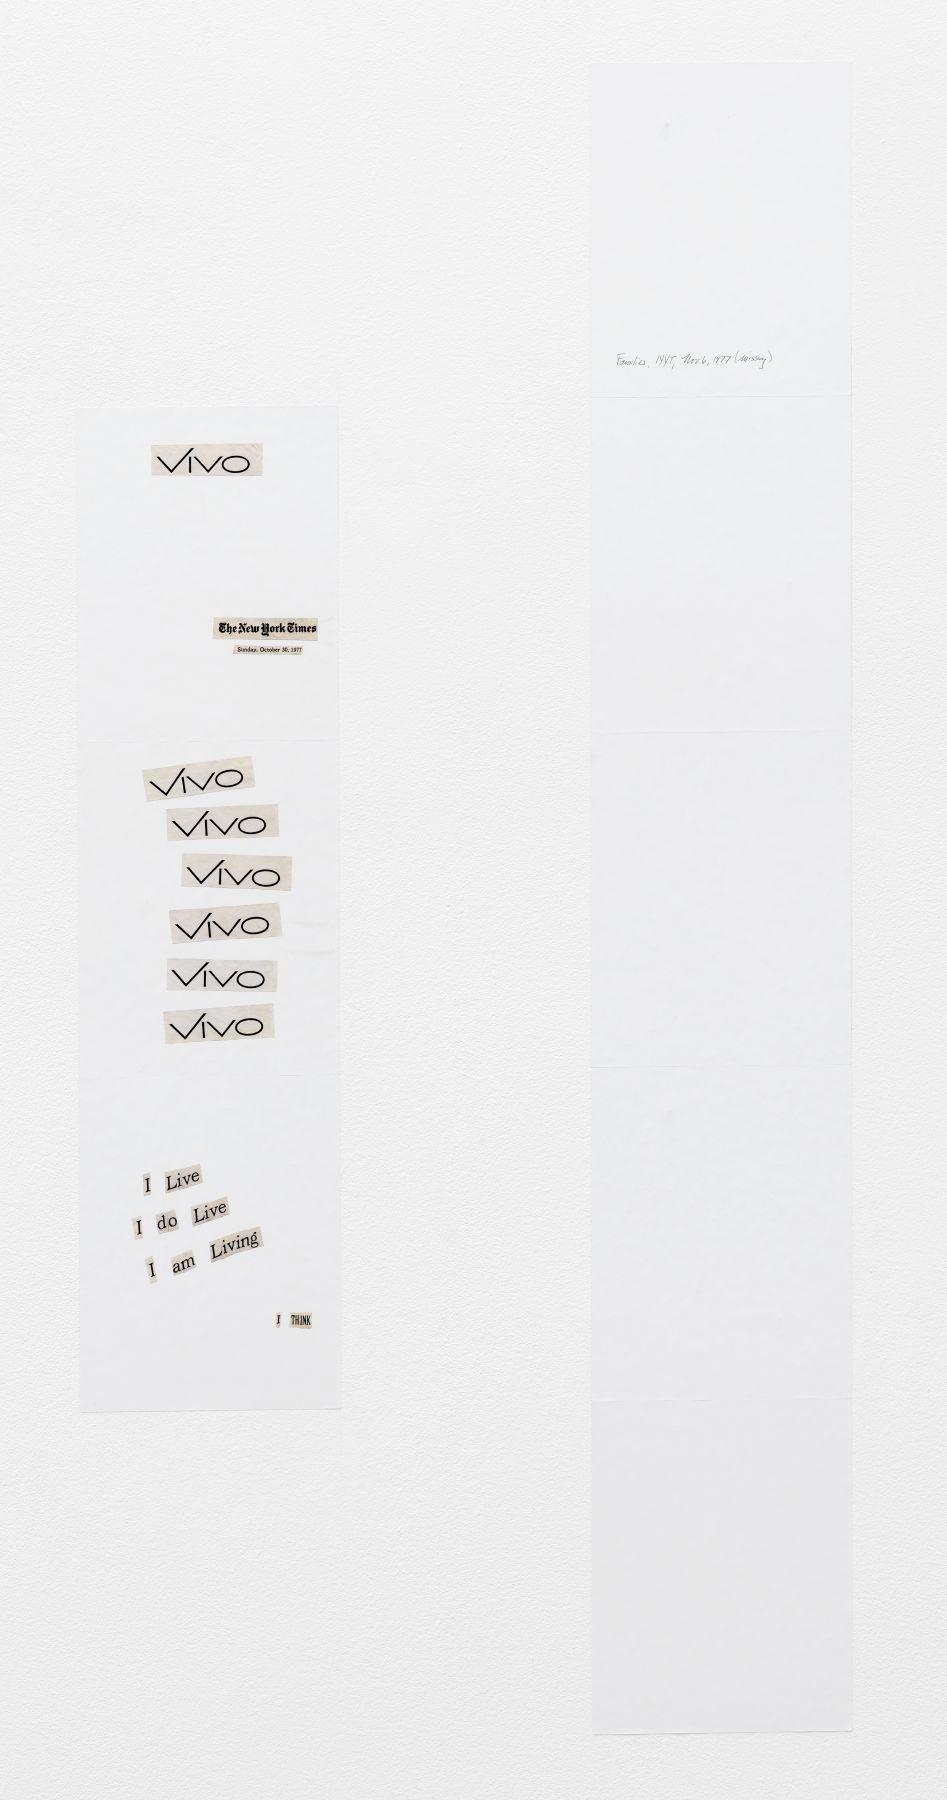 p.p1 {margin: 0.0px 0.0px 0.0px 0.0px; line-height: 14.0px; font: 12.0px 'Helvetica Neue'; color: #000000; -webkit-text-stroke: #000000; background-color: #ffffff}